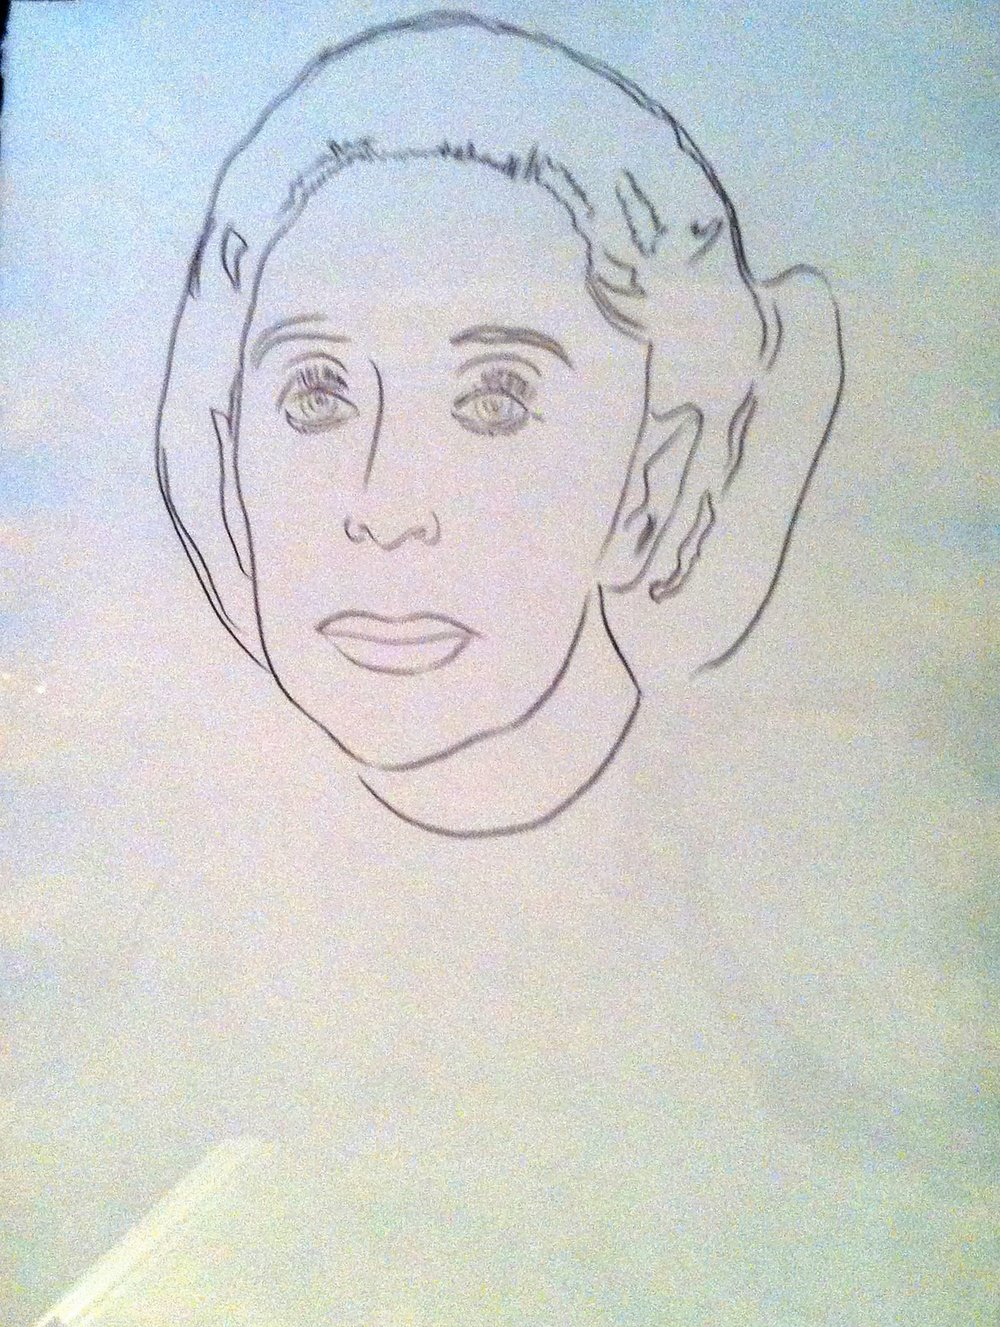 Andy Warhol - Martha Graham Portrait - Additional Information